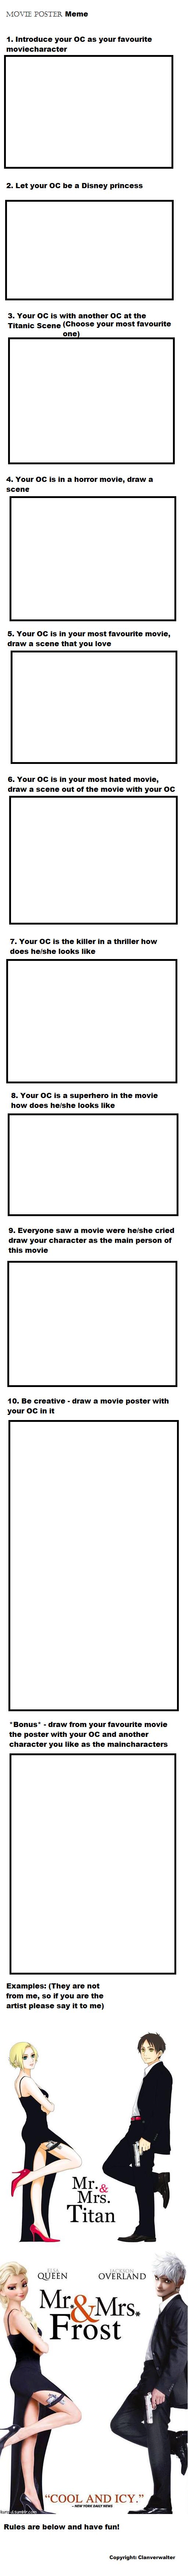 Movie Poster Meme by Clanverwalter